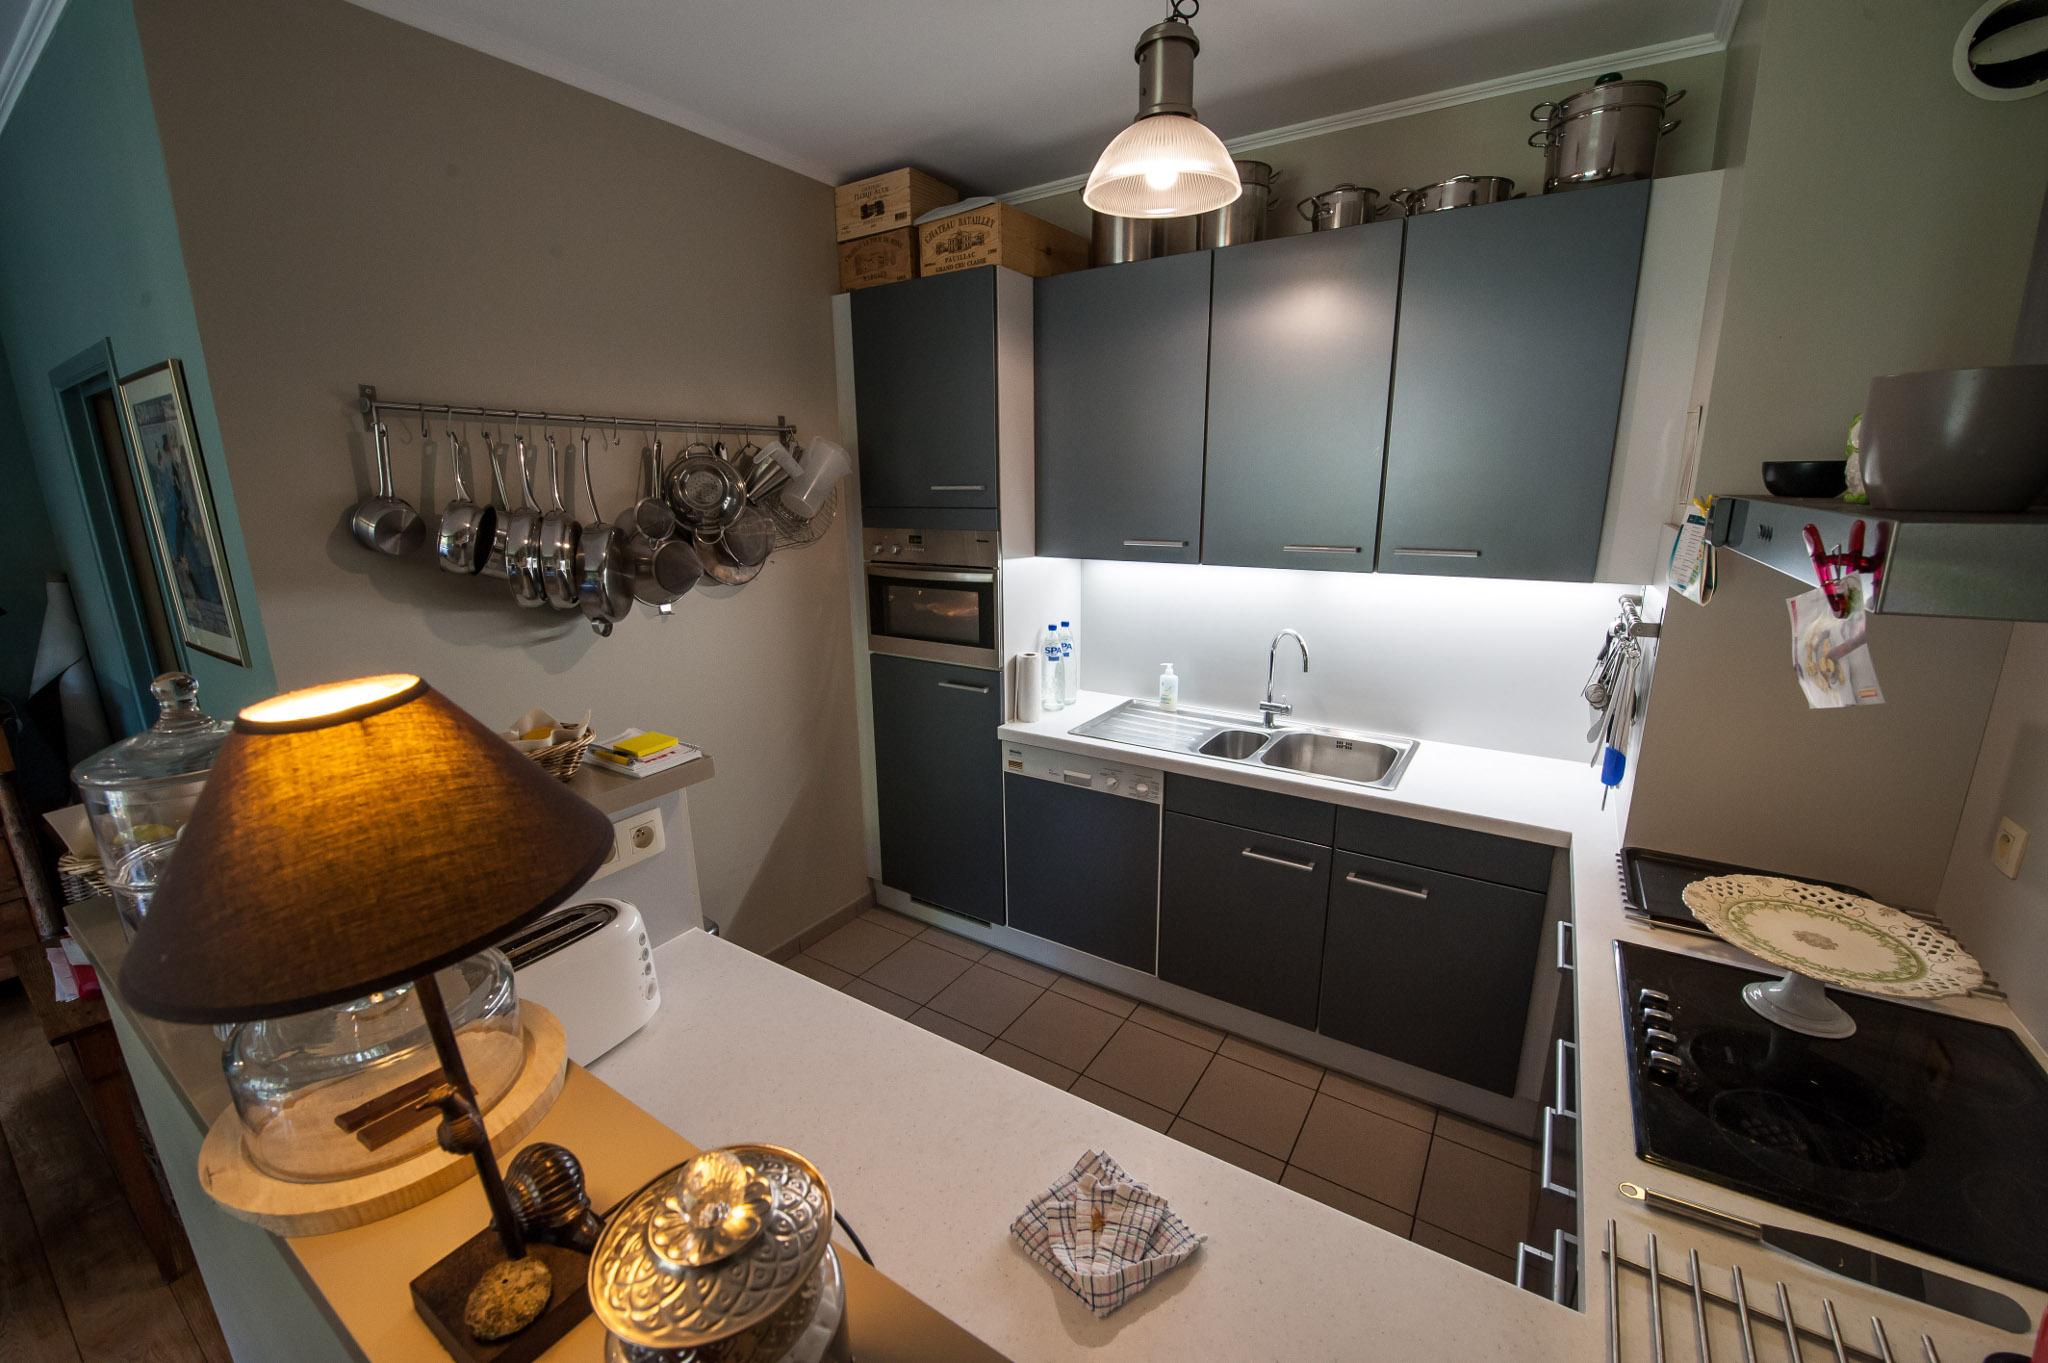 Petite cuisine intégrée au séjour